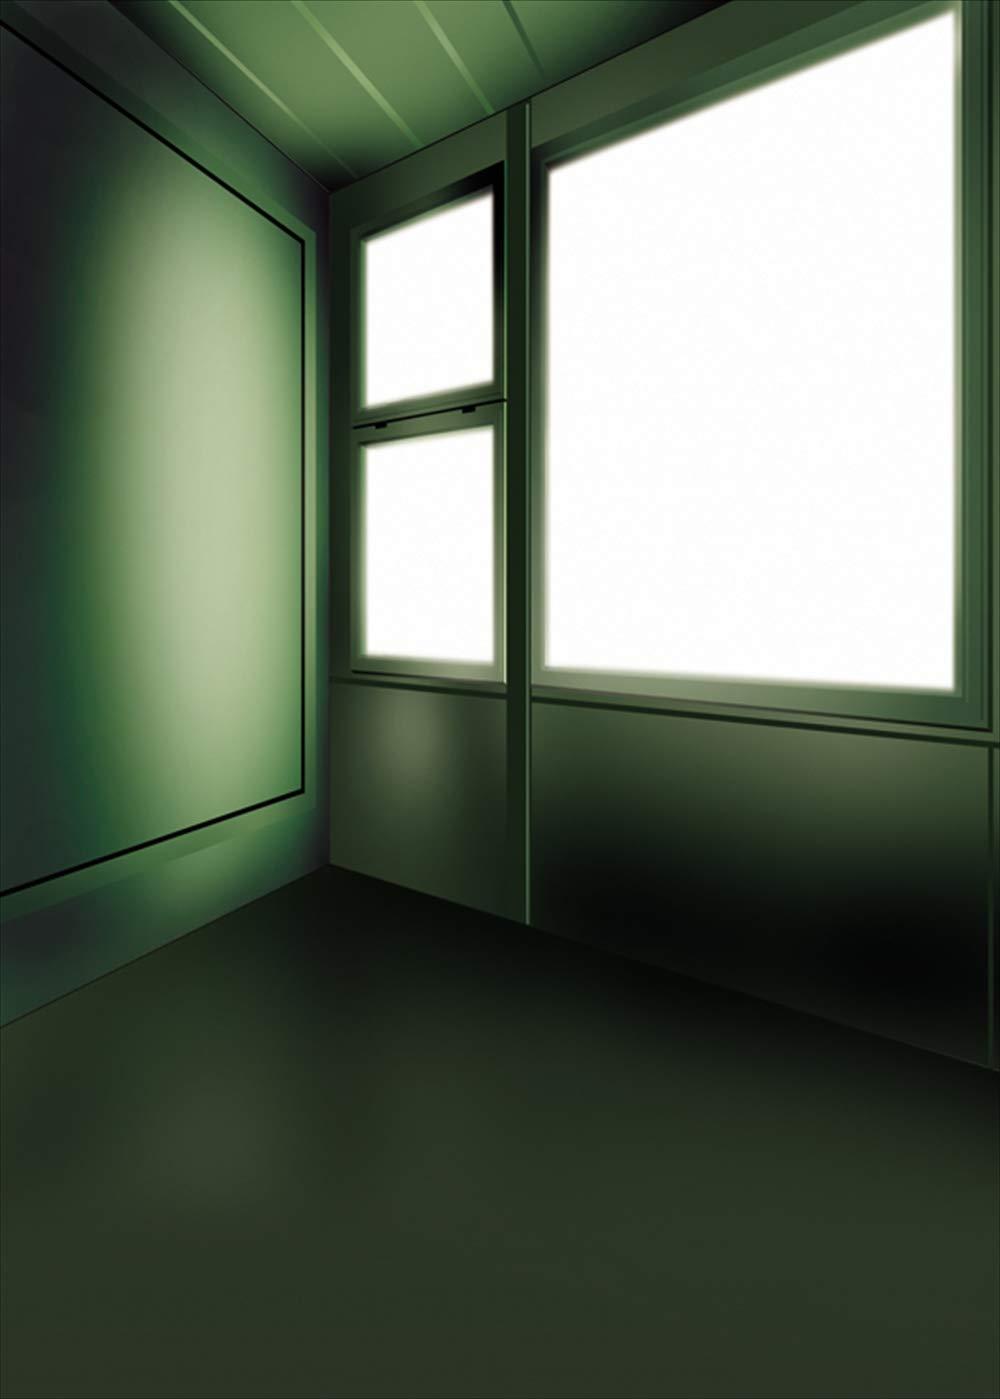 y-4525 大人サイズ撮影用背景布(幅3m x 高さ6m)   B07PNK8JRS